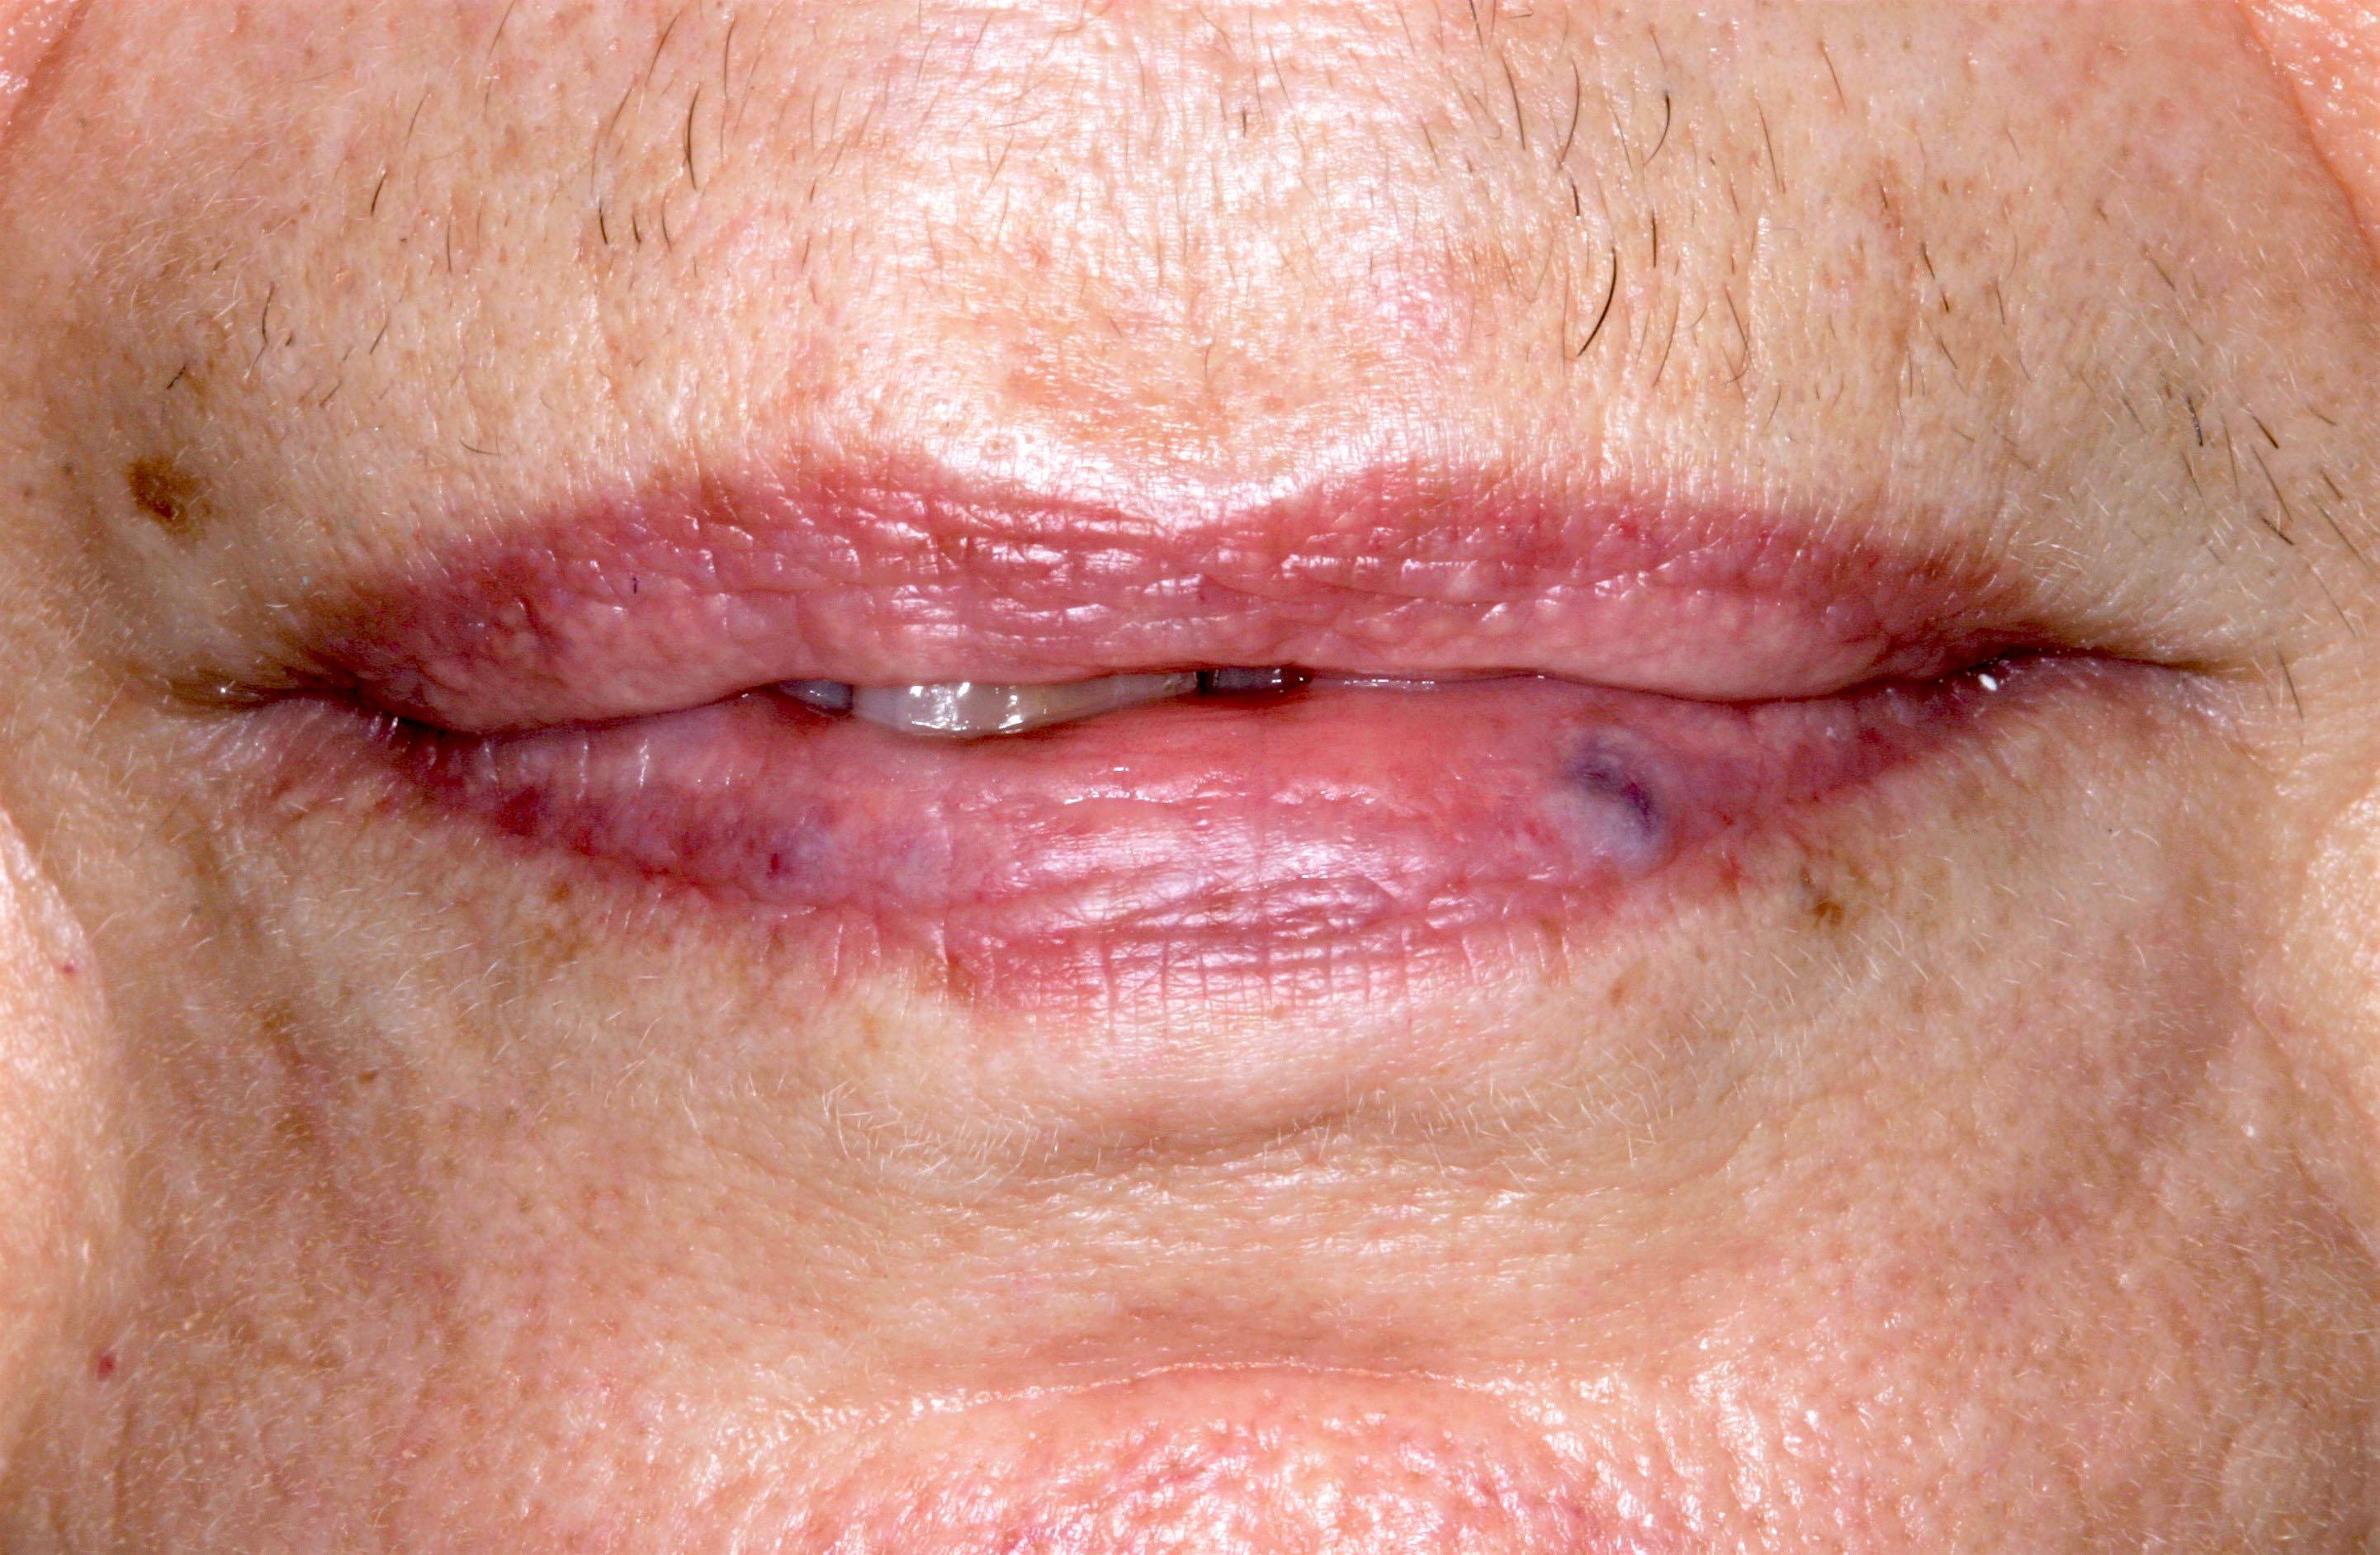 Varicosity on lower lip